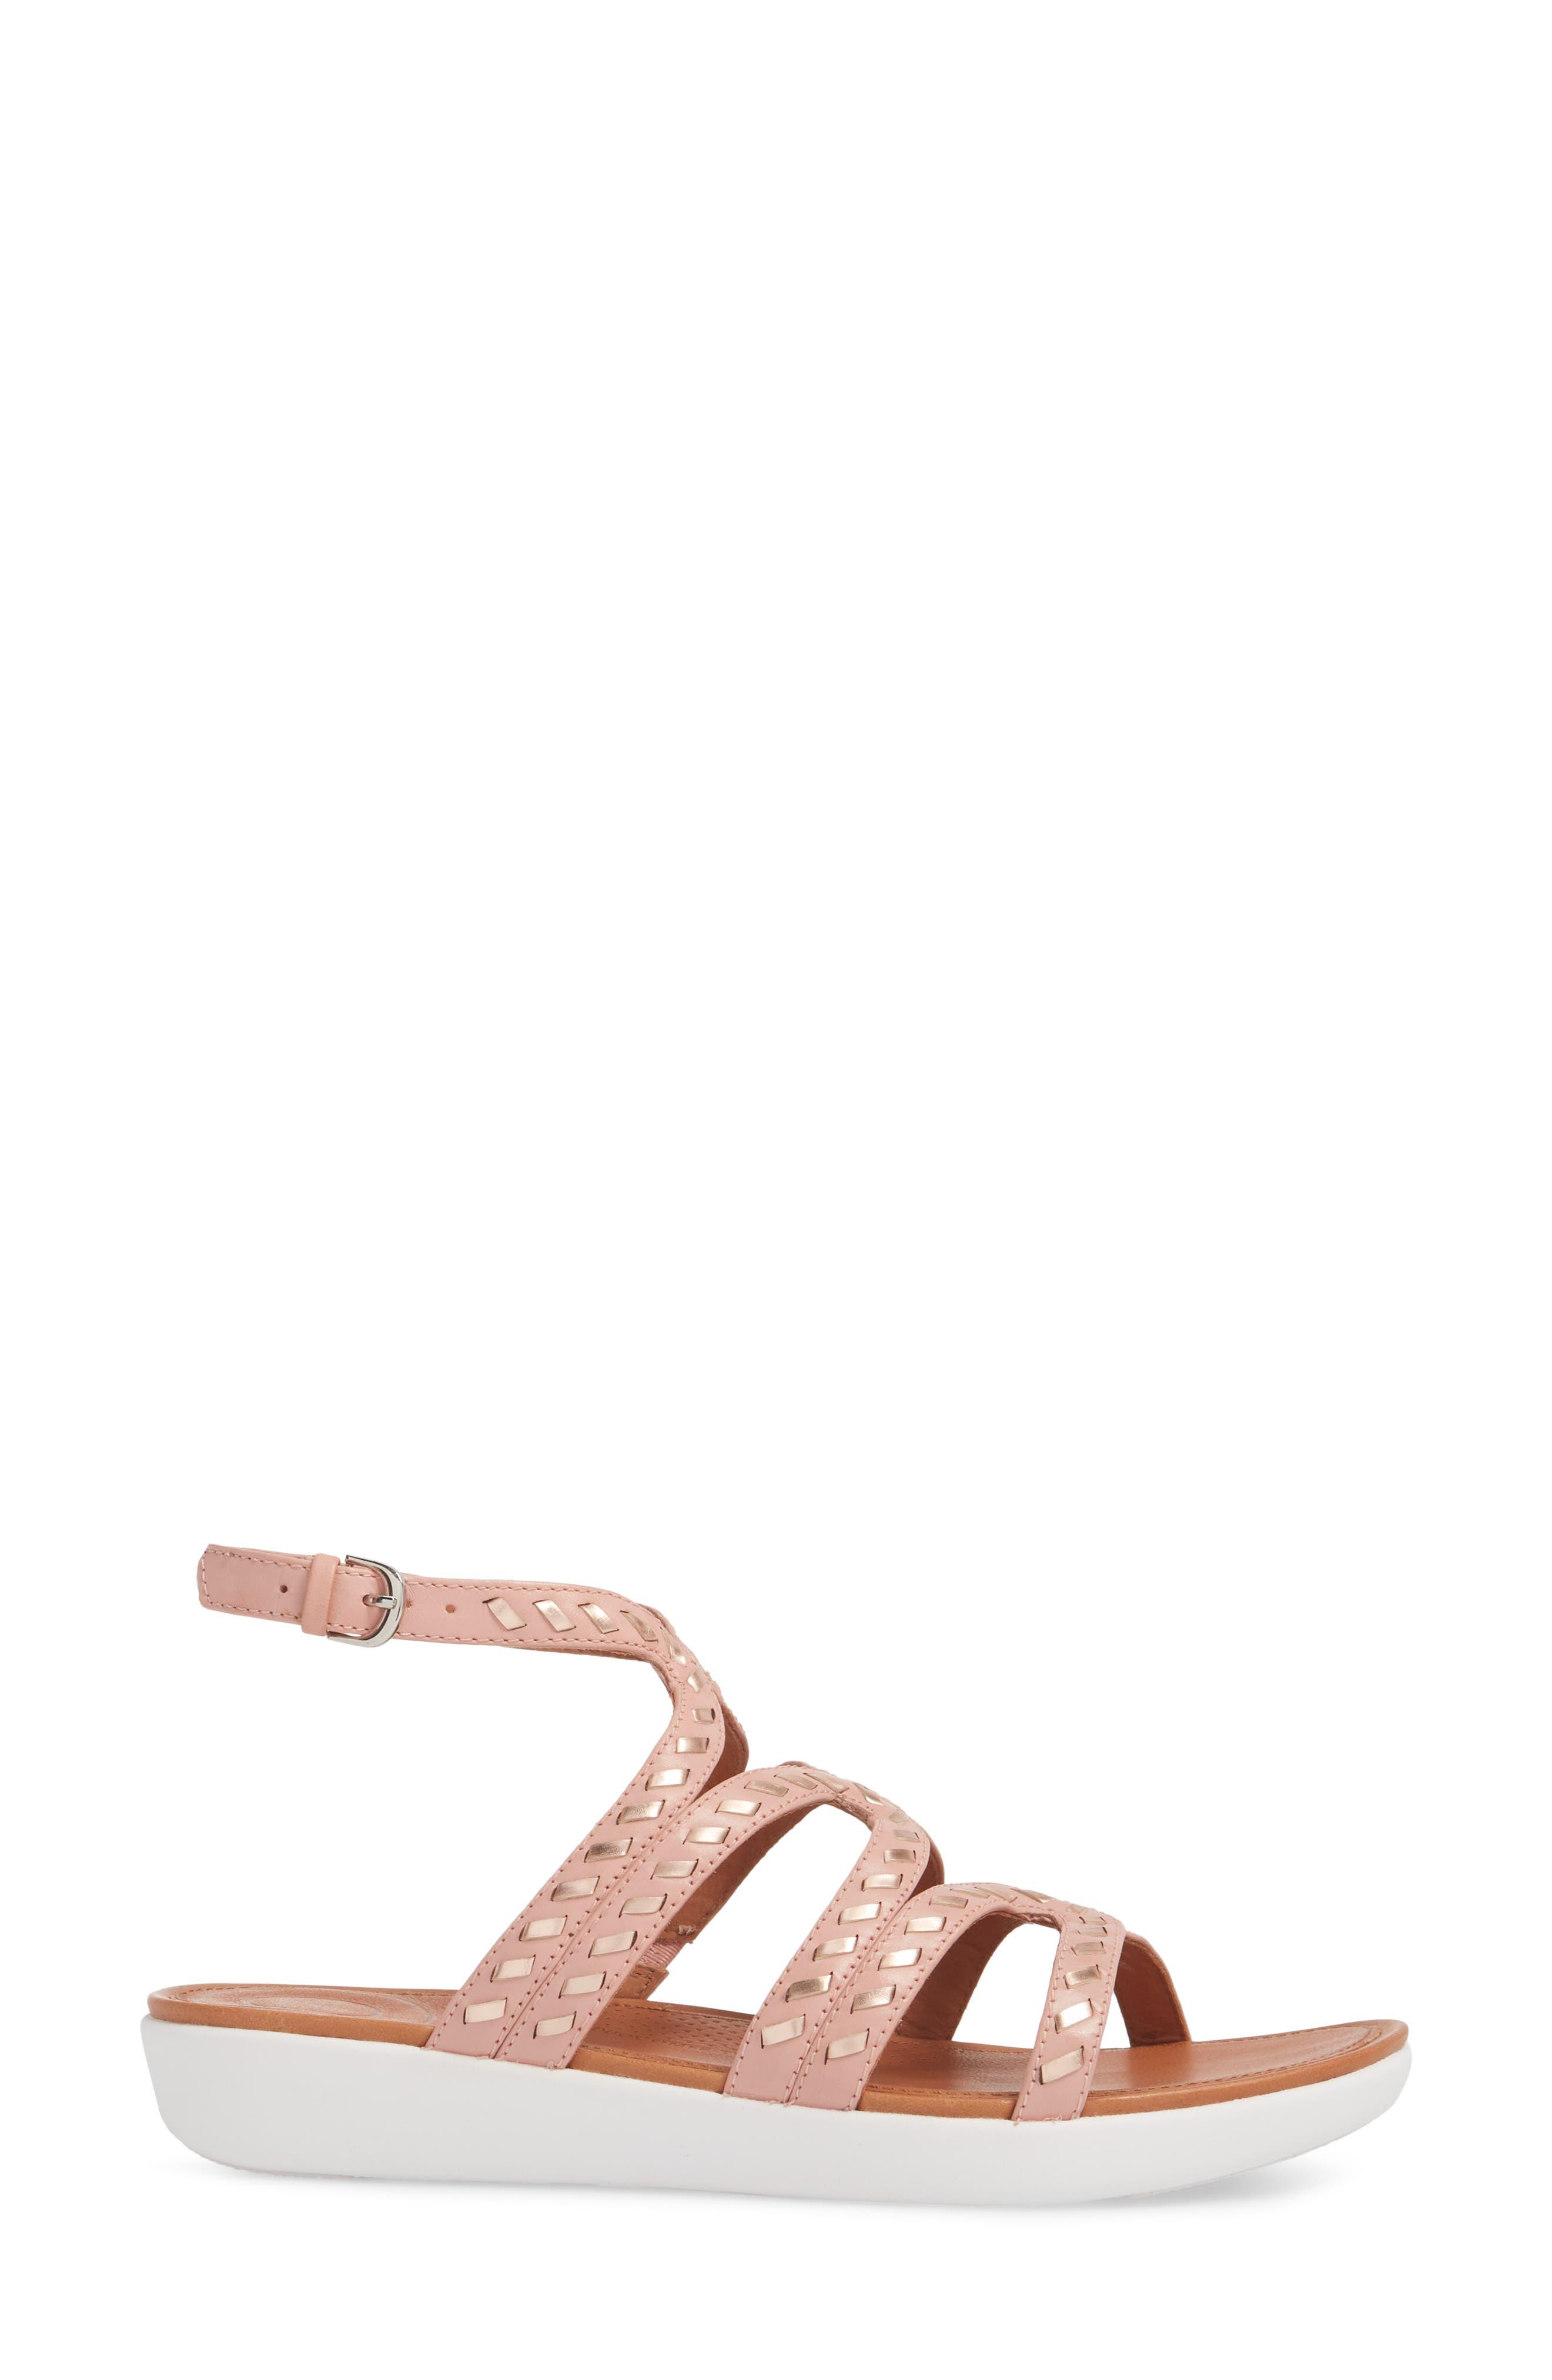 FITFLOP,                             Strata Gladiator Sandal,                             Alternate thumbnail 3, color,                             DUSKY PINK LEATHER